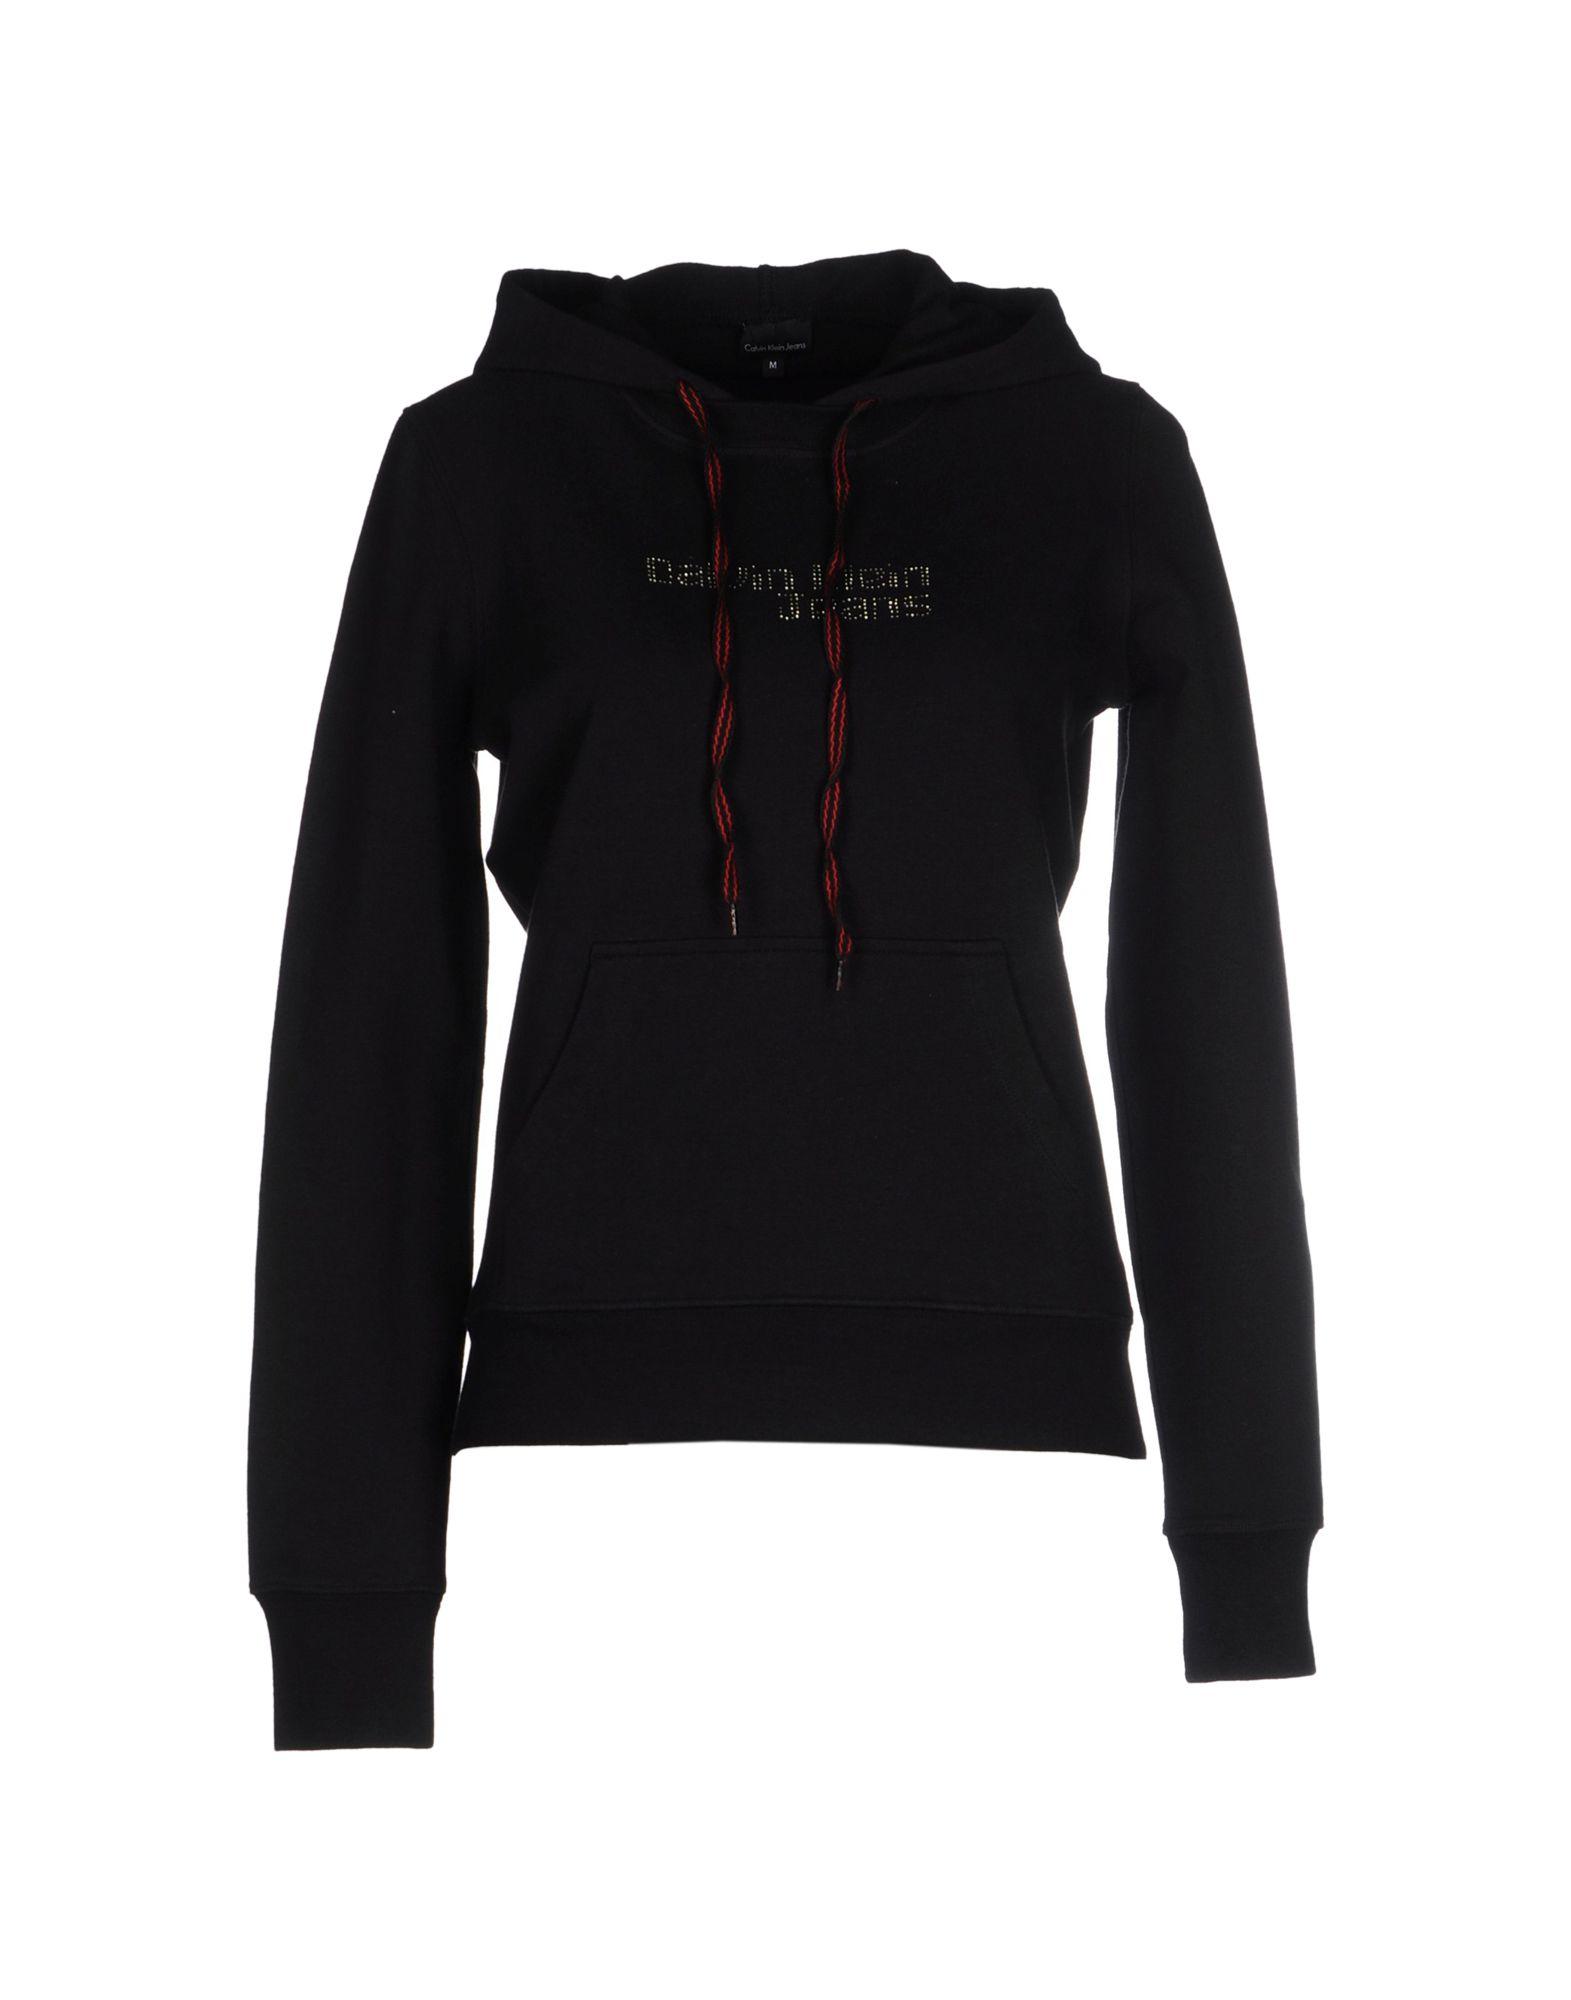 calvin klein jeans sweatshirt in black lyst. Black Bedroom Furniture Sets. Home Design Ideas